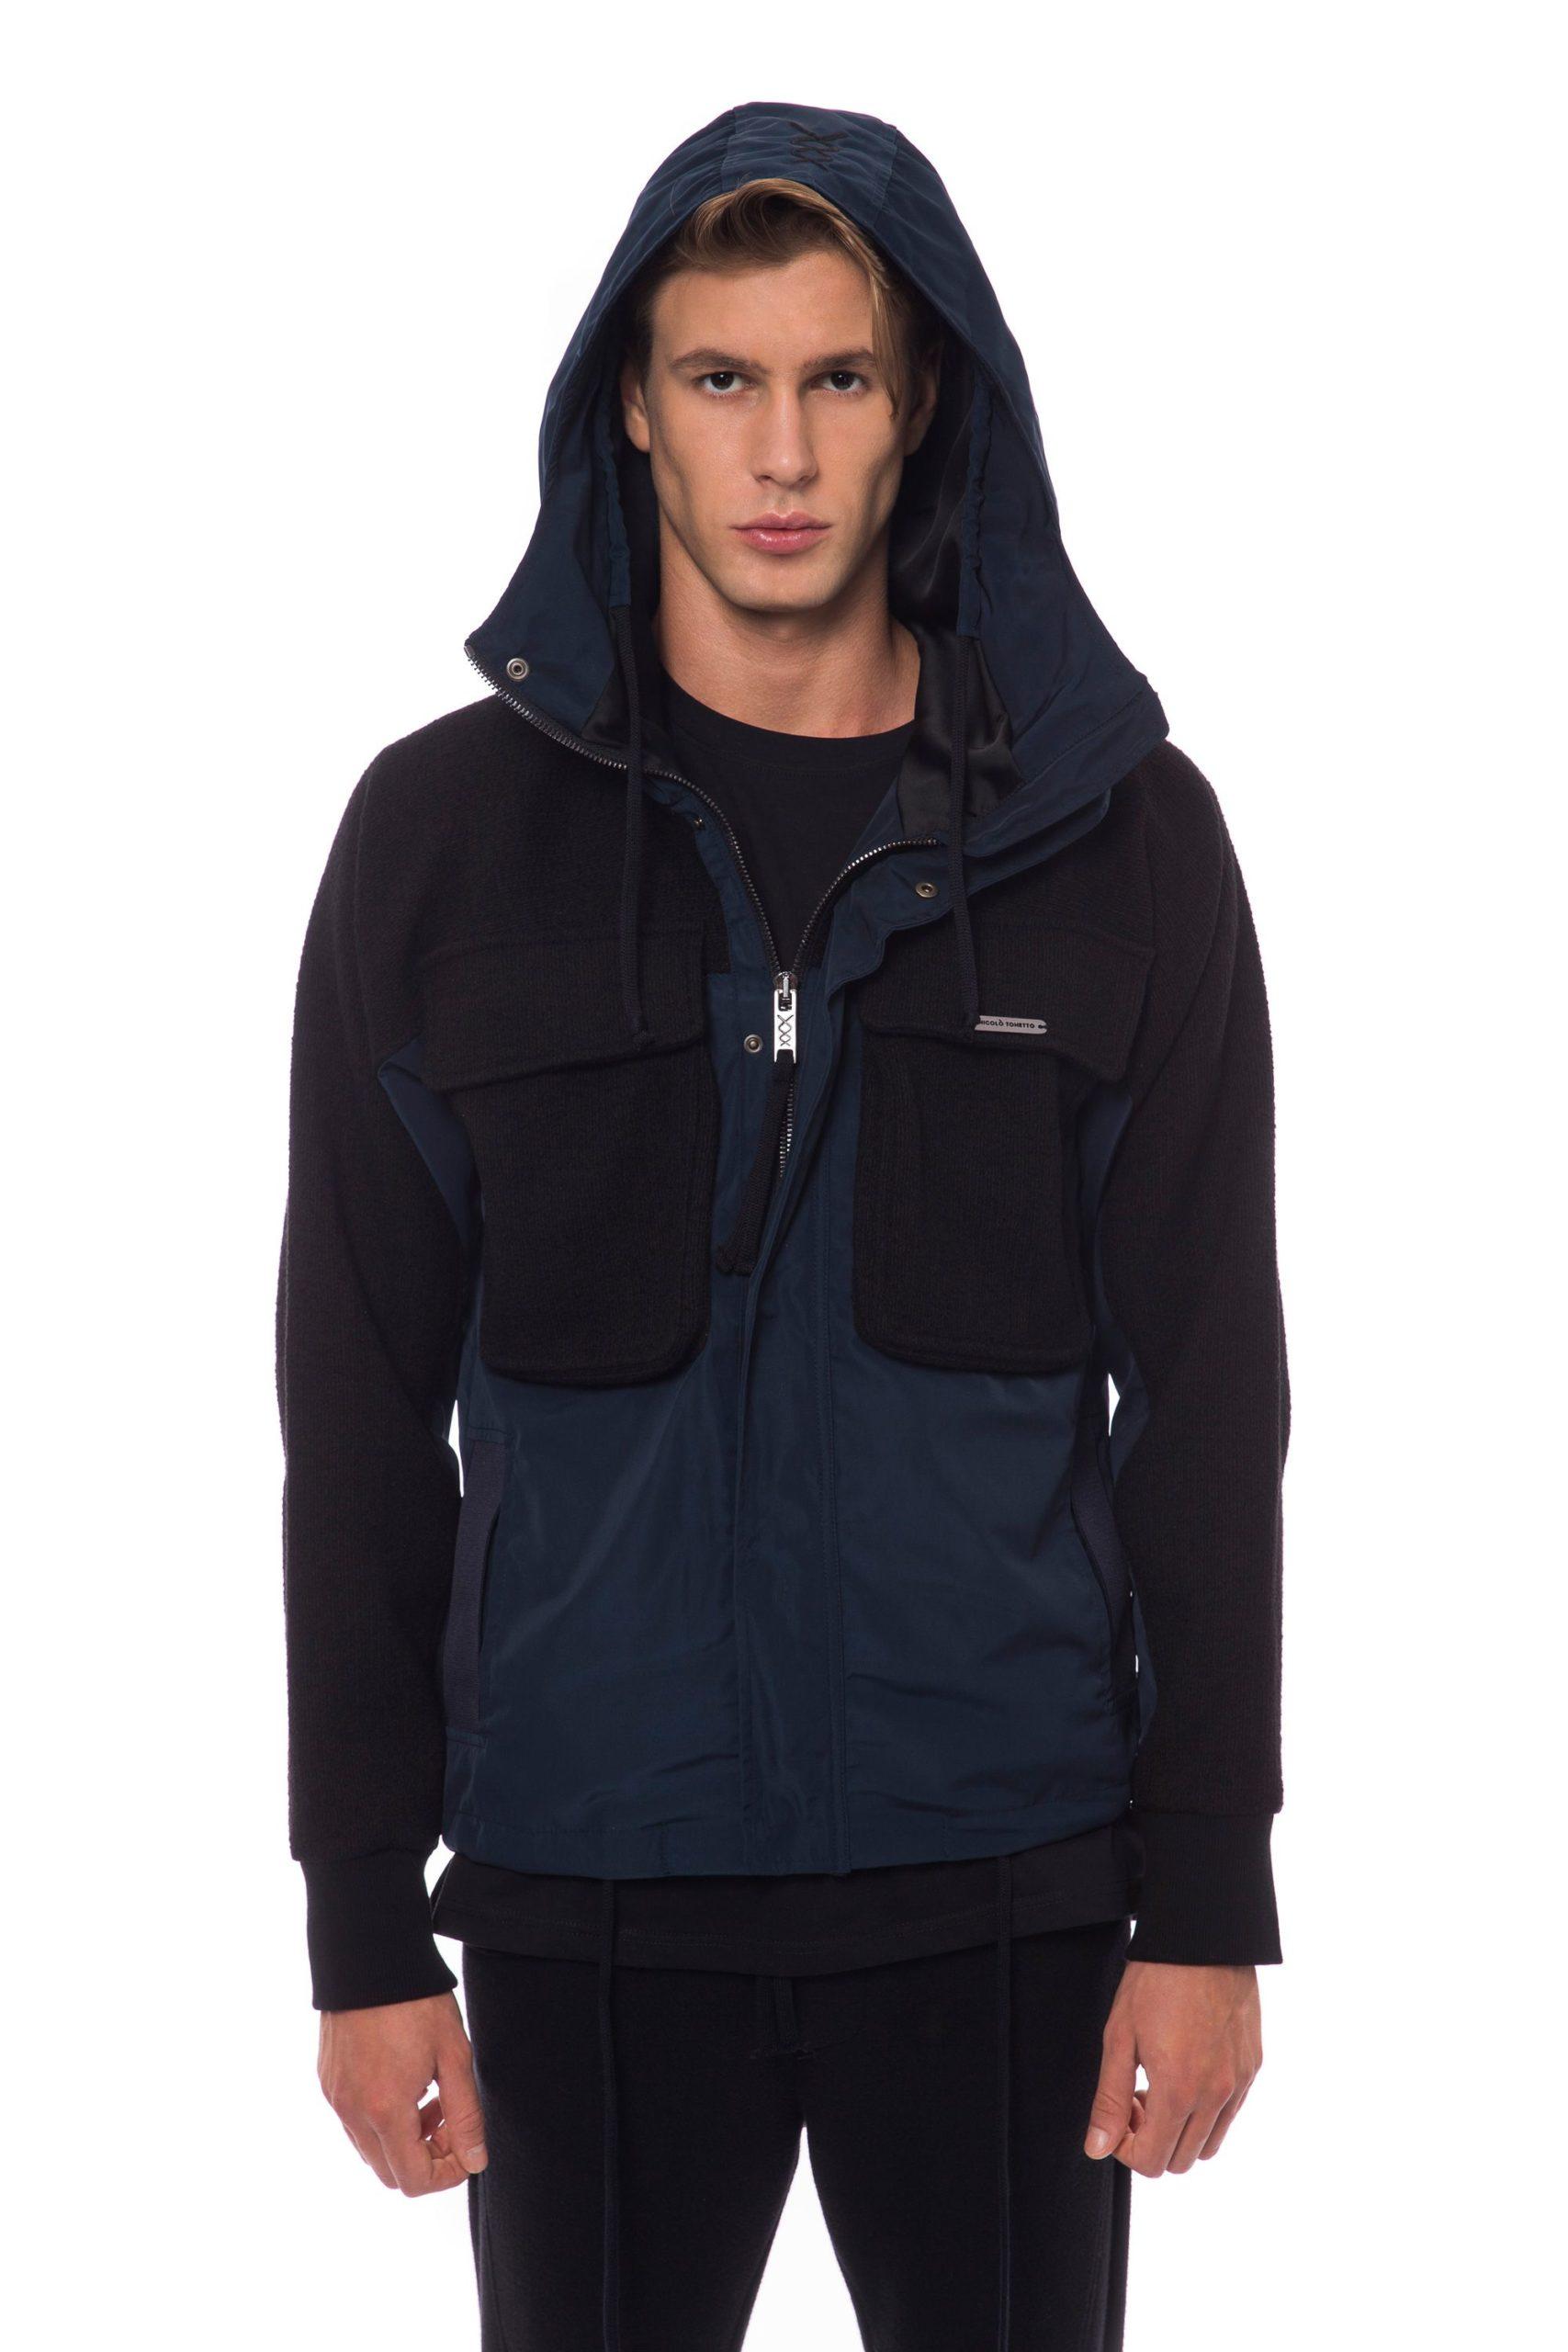 Nicolo Tonetto Men's Jacket Black NI822798 - S